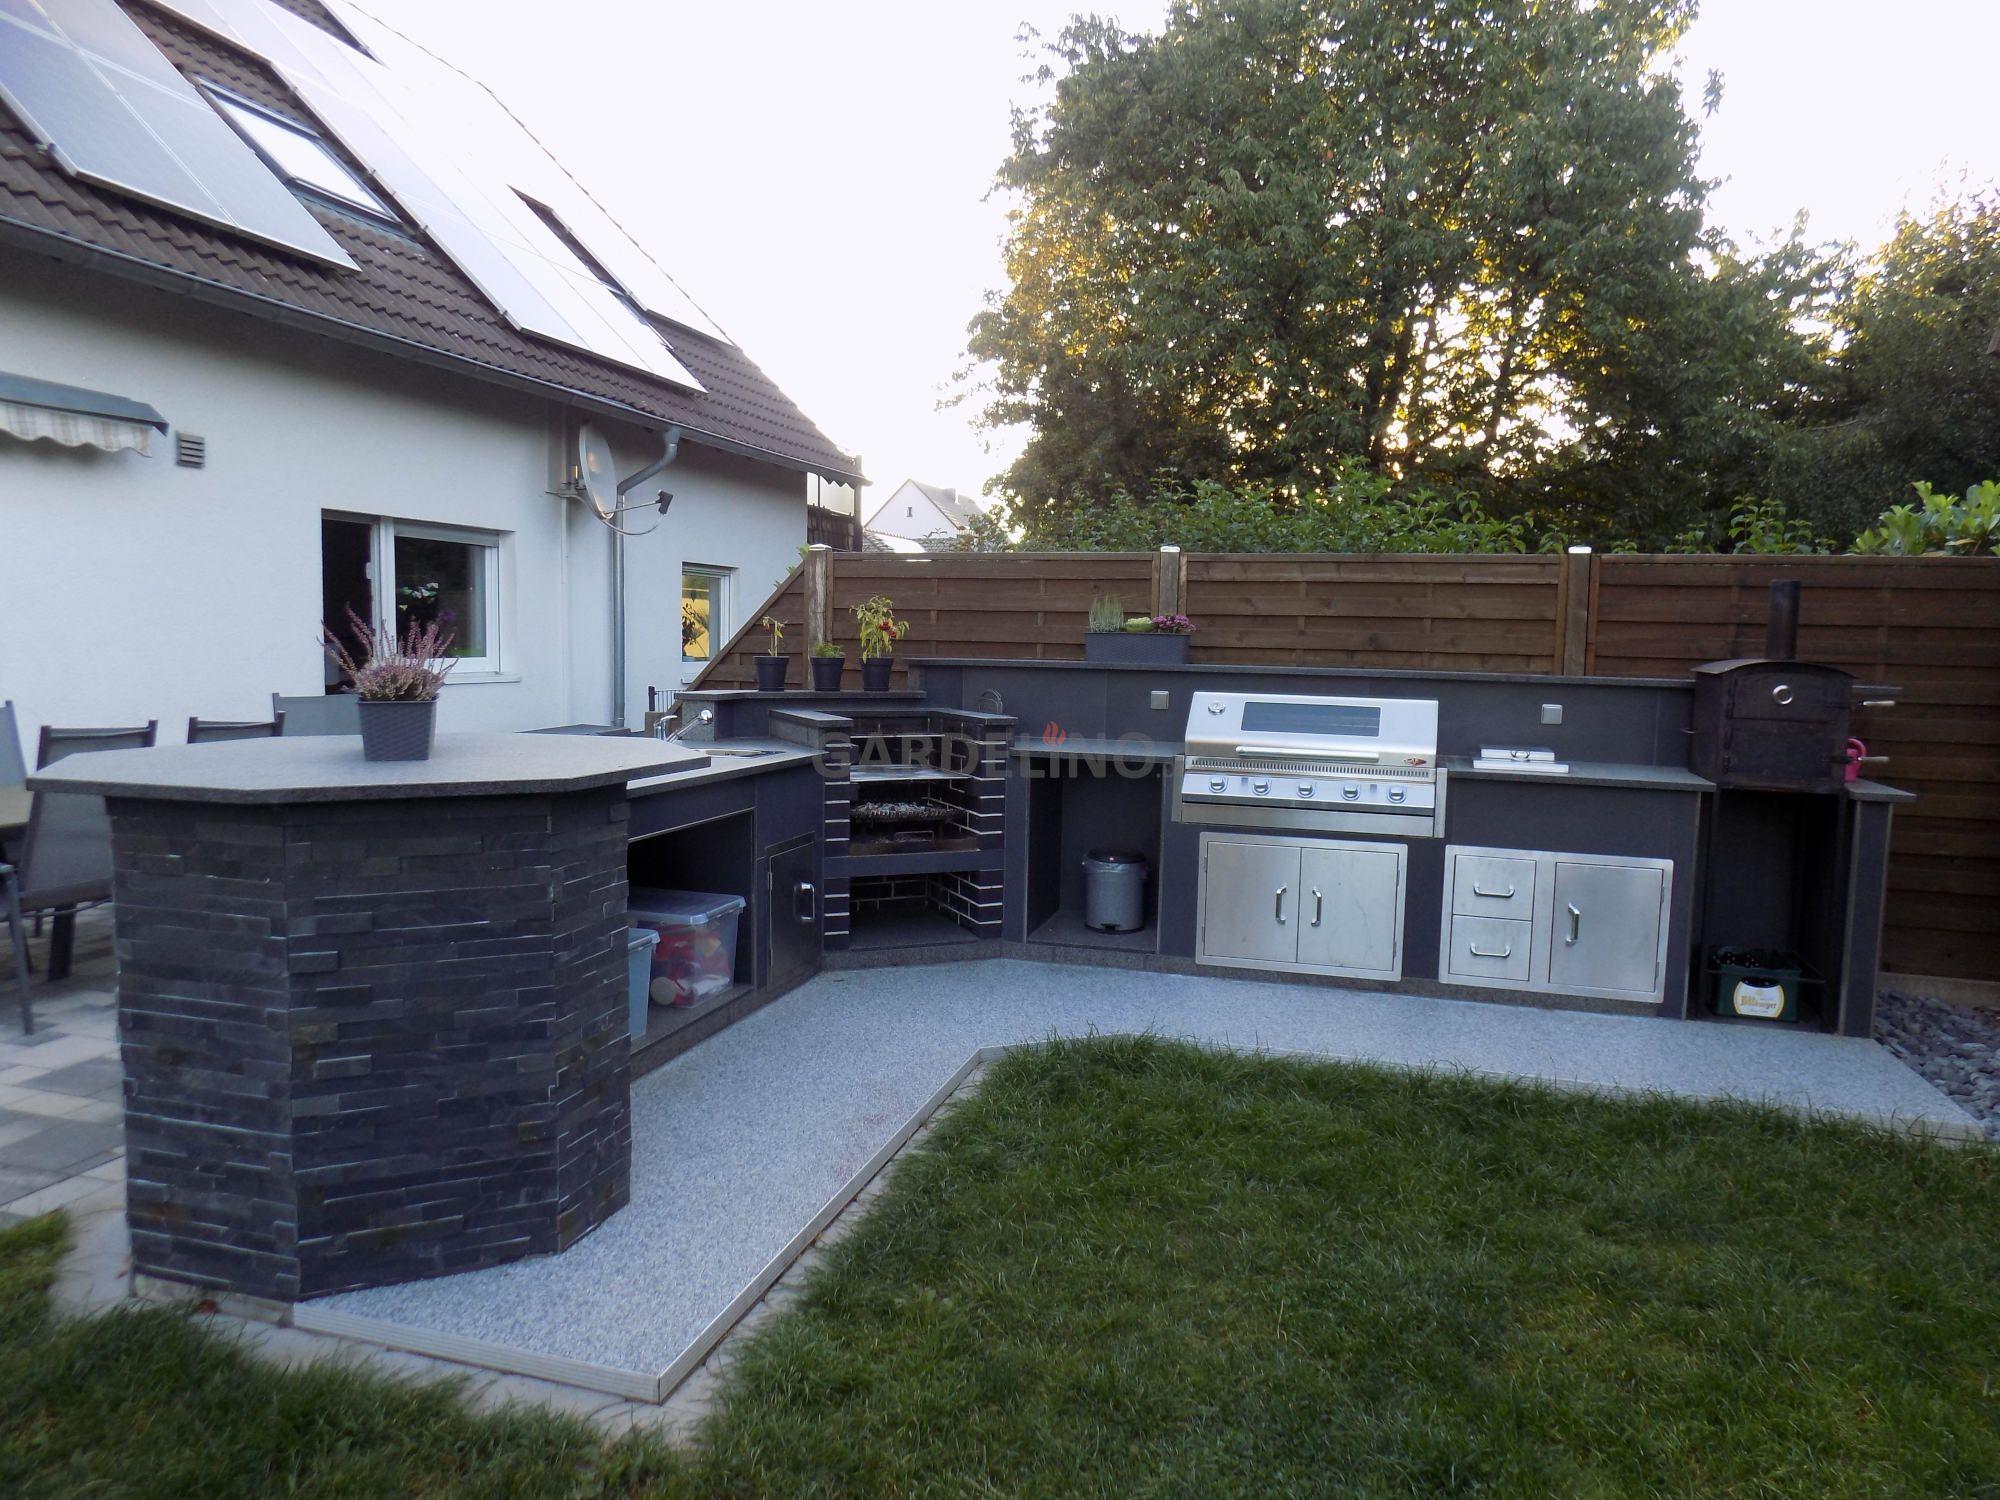 Großzügige Outdoor Küche mit BeefEater Grill, Kochfeld